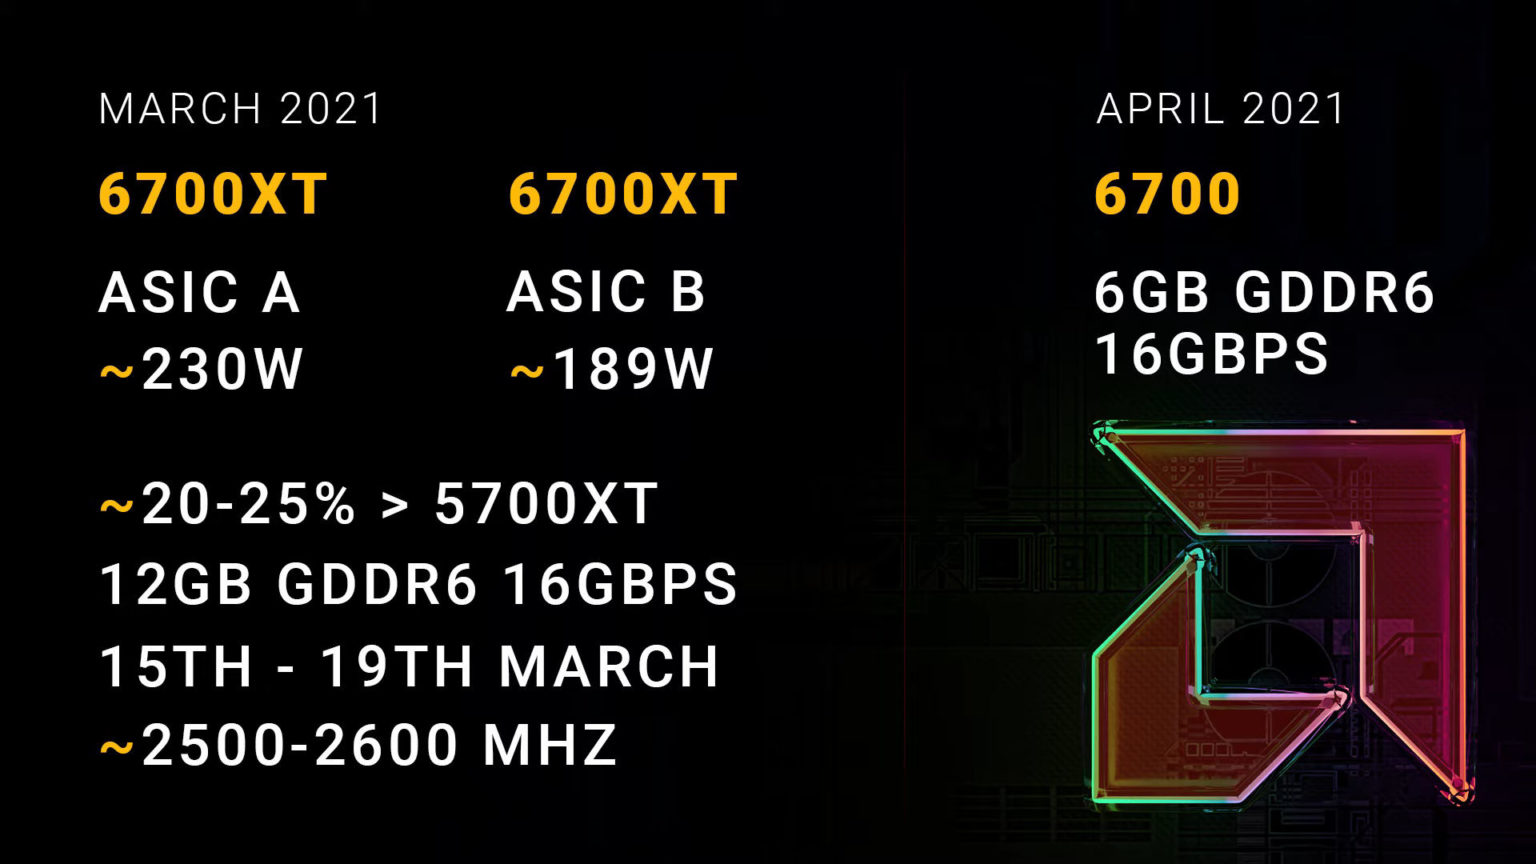 https://www.coolaler.com.tw/image/news/21/02/AMD-Radeon-RX-6700-XT-ASIC-A-vs-B.jpg